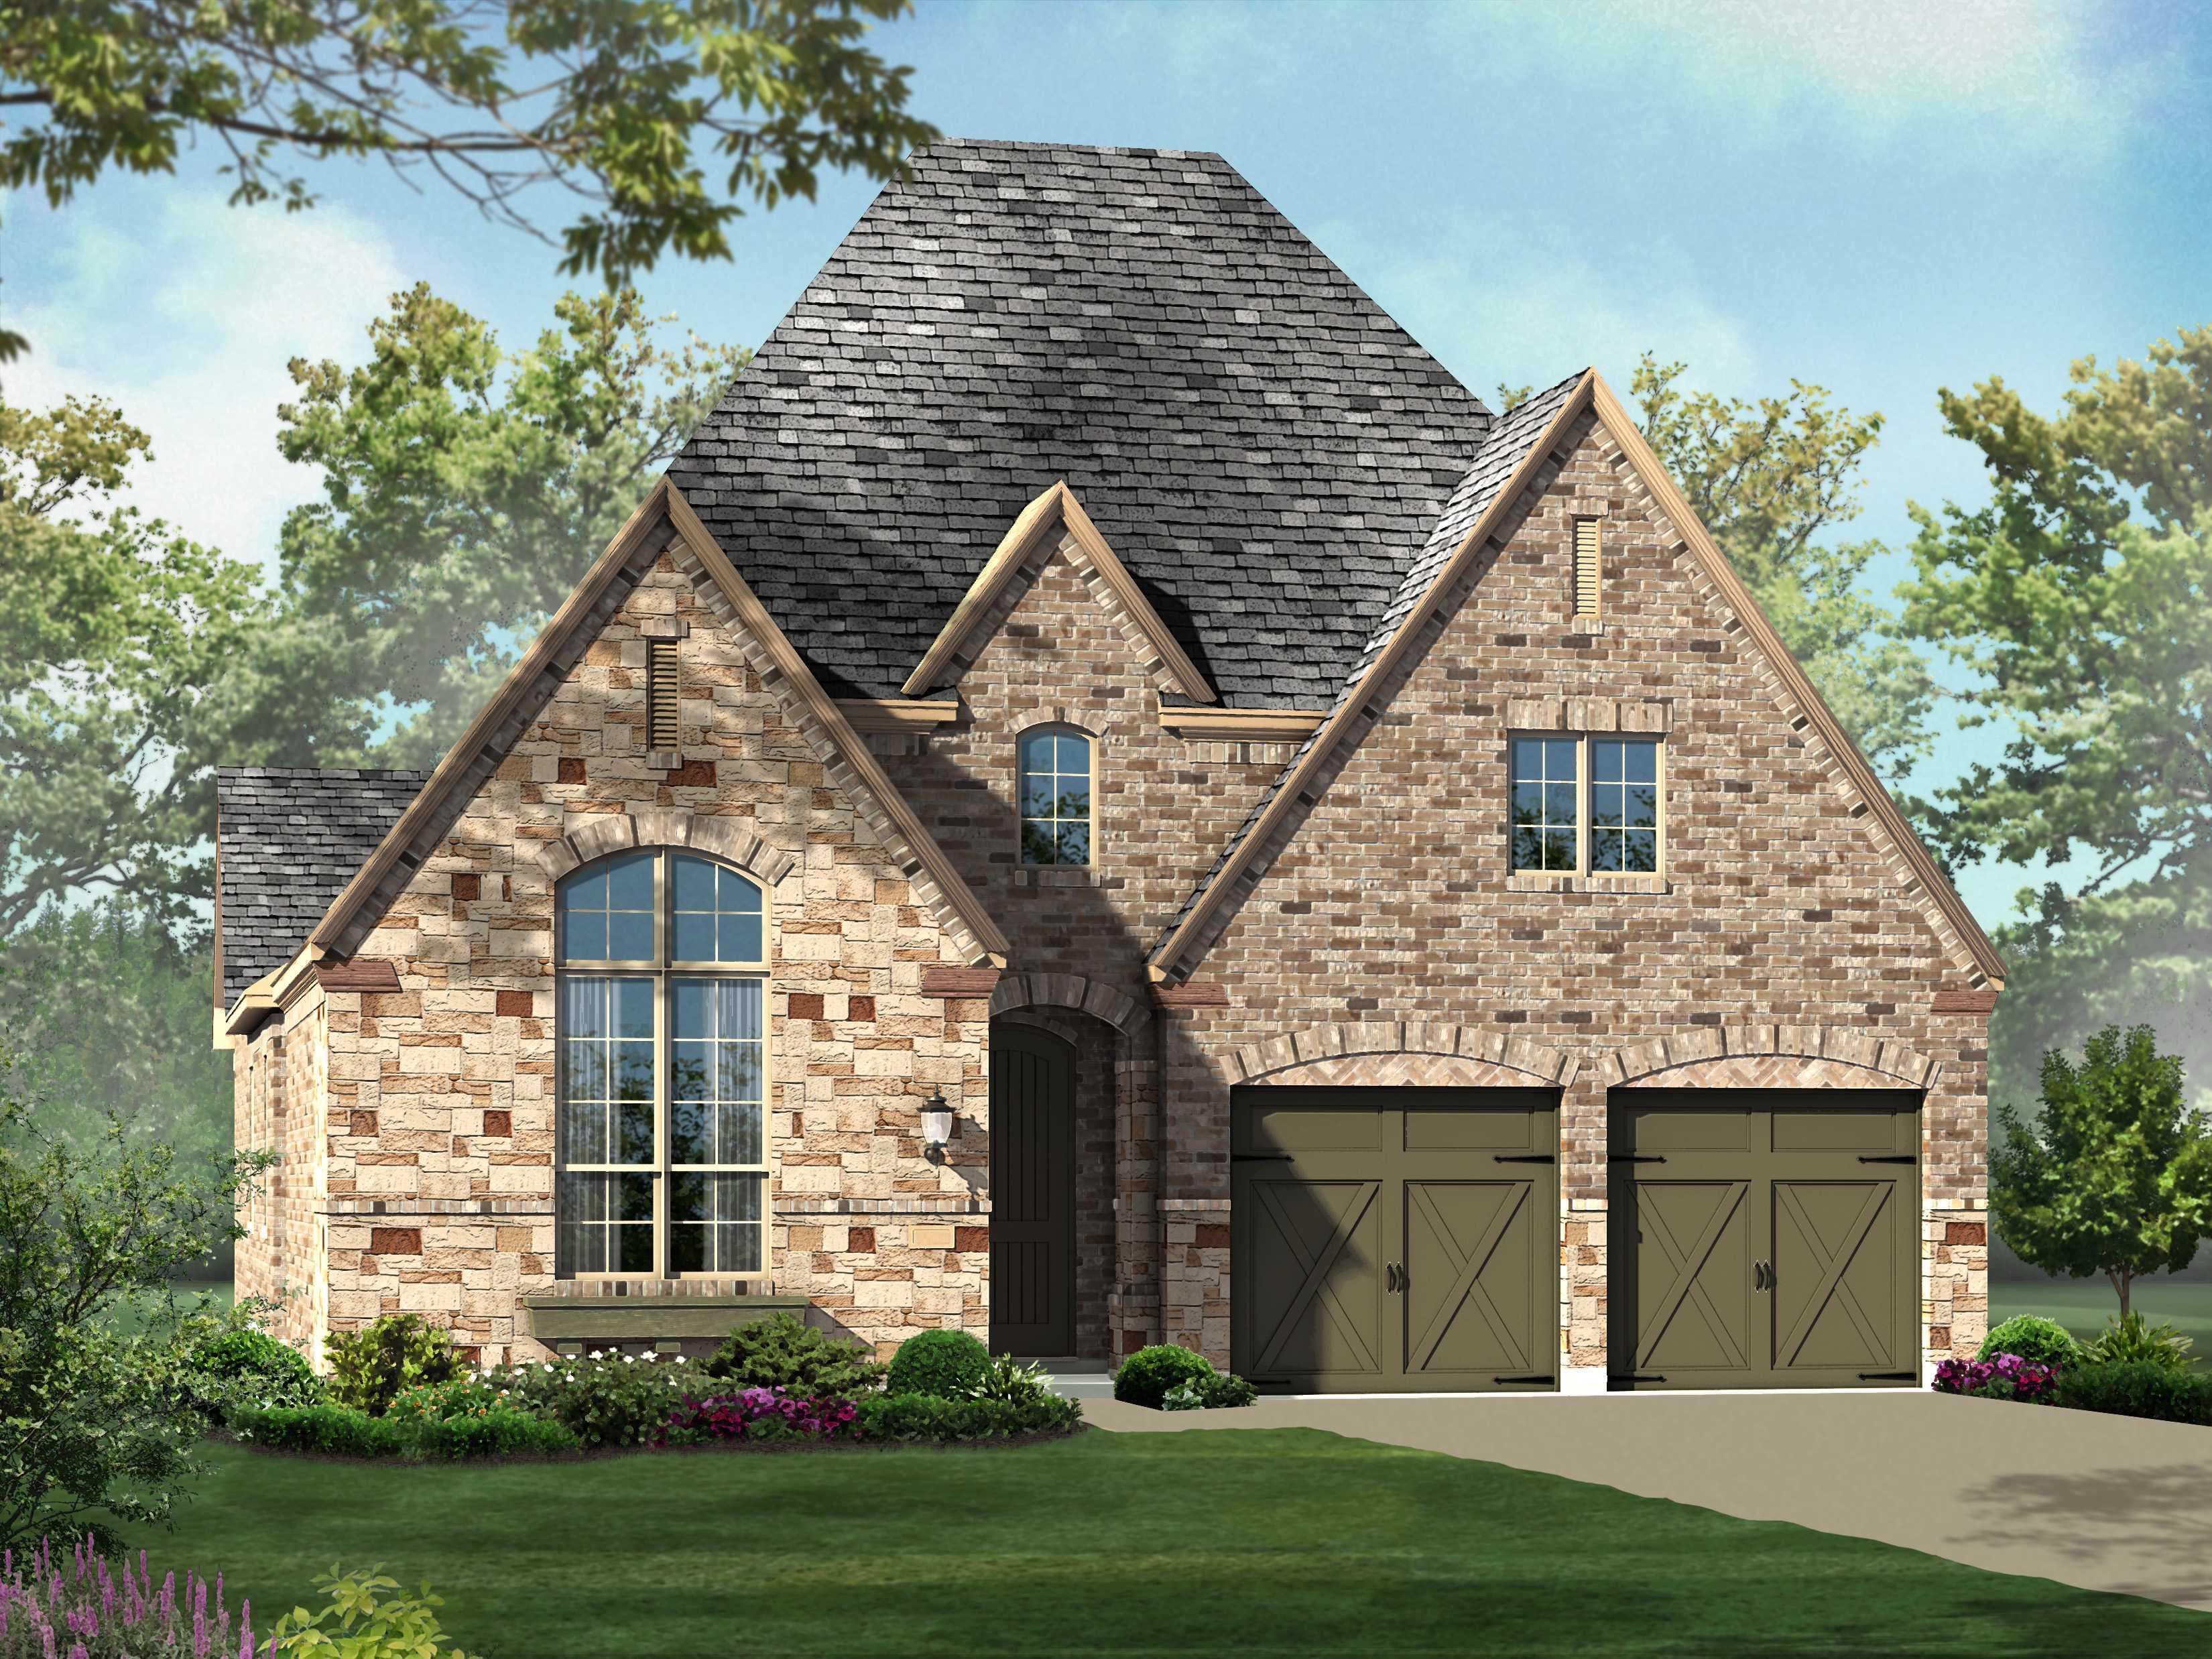 highland homes windsong ranch 60s plan 597 1329612 prosper tx new home for sale homegain